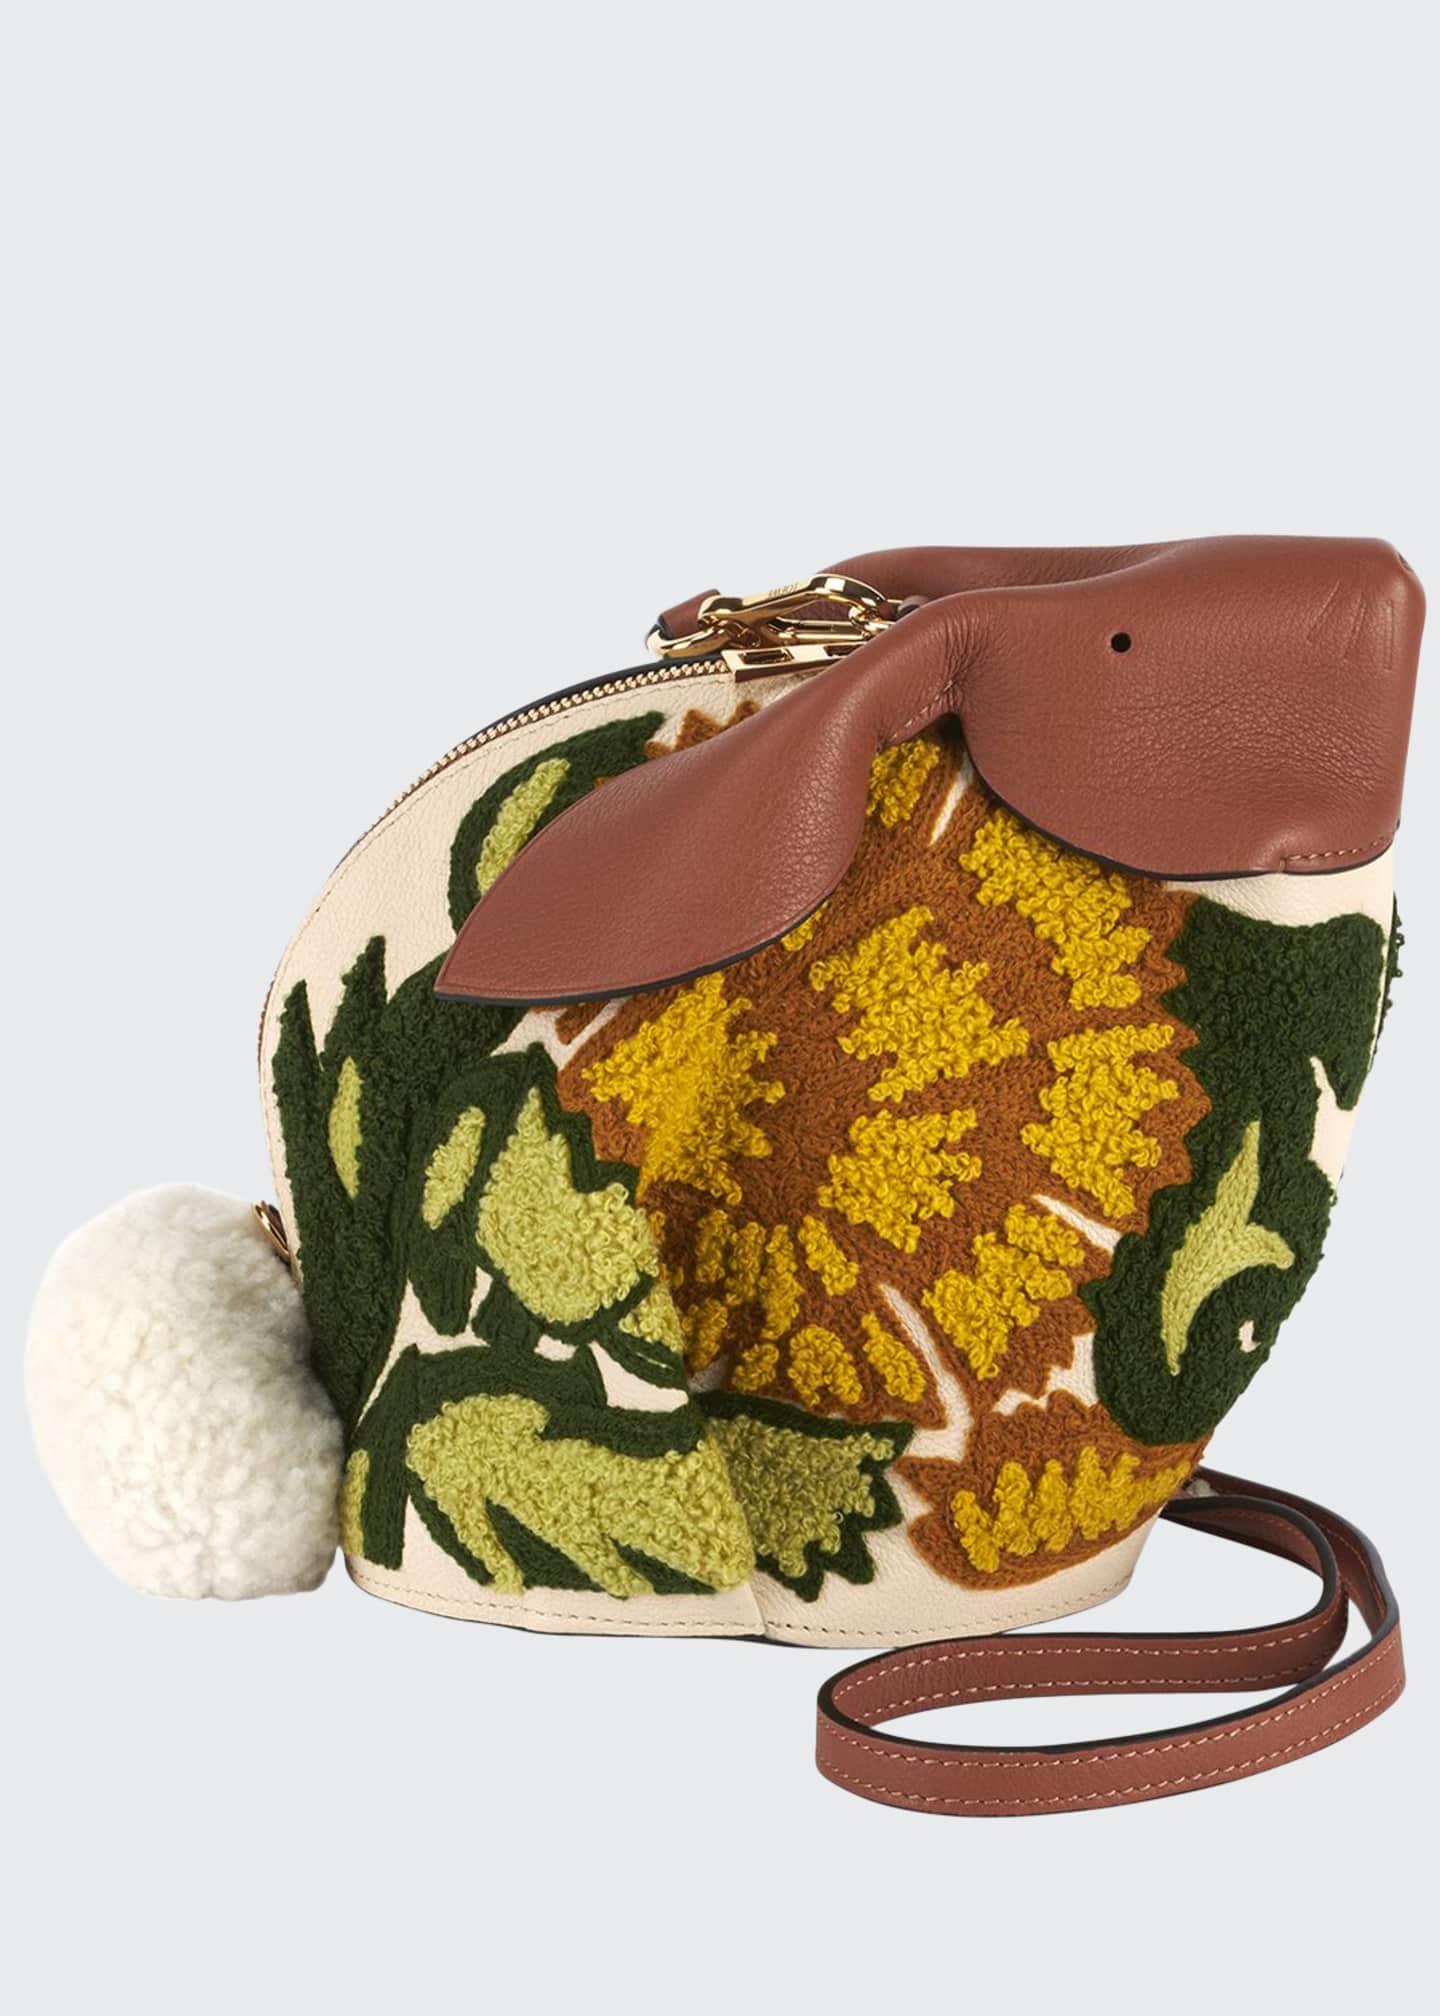 Loewe Bunny Floral Classic Crossbody Bag